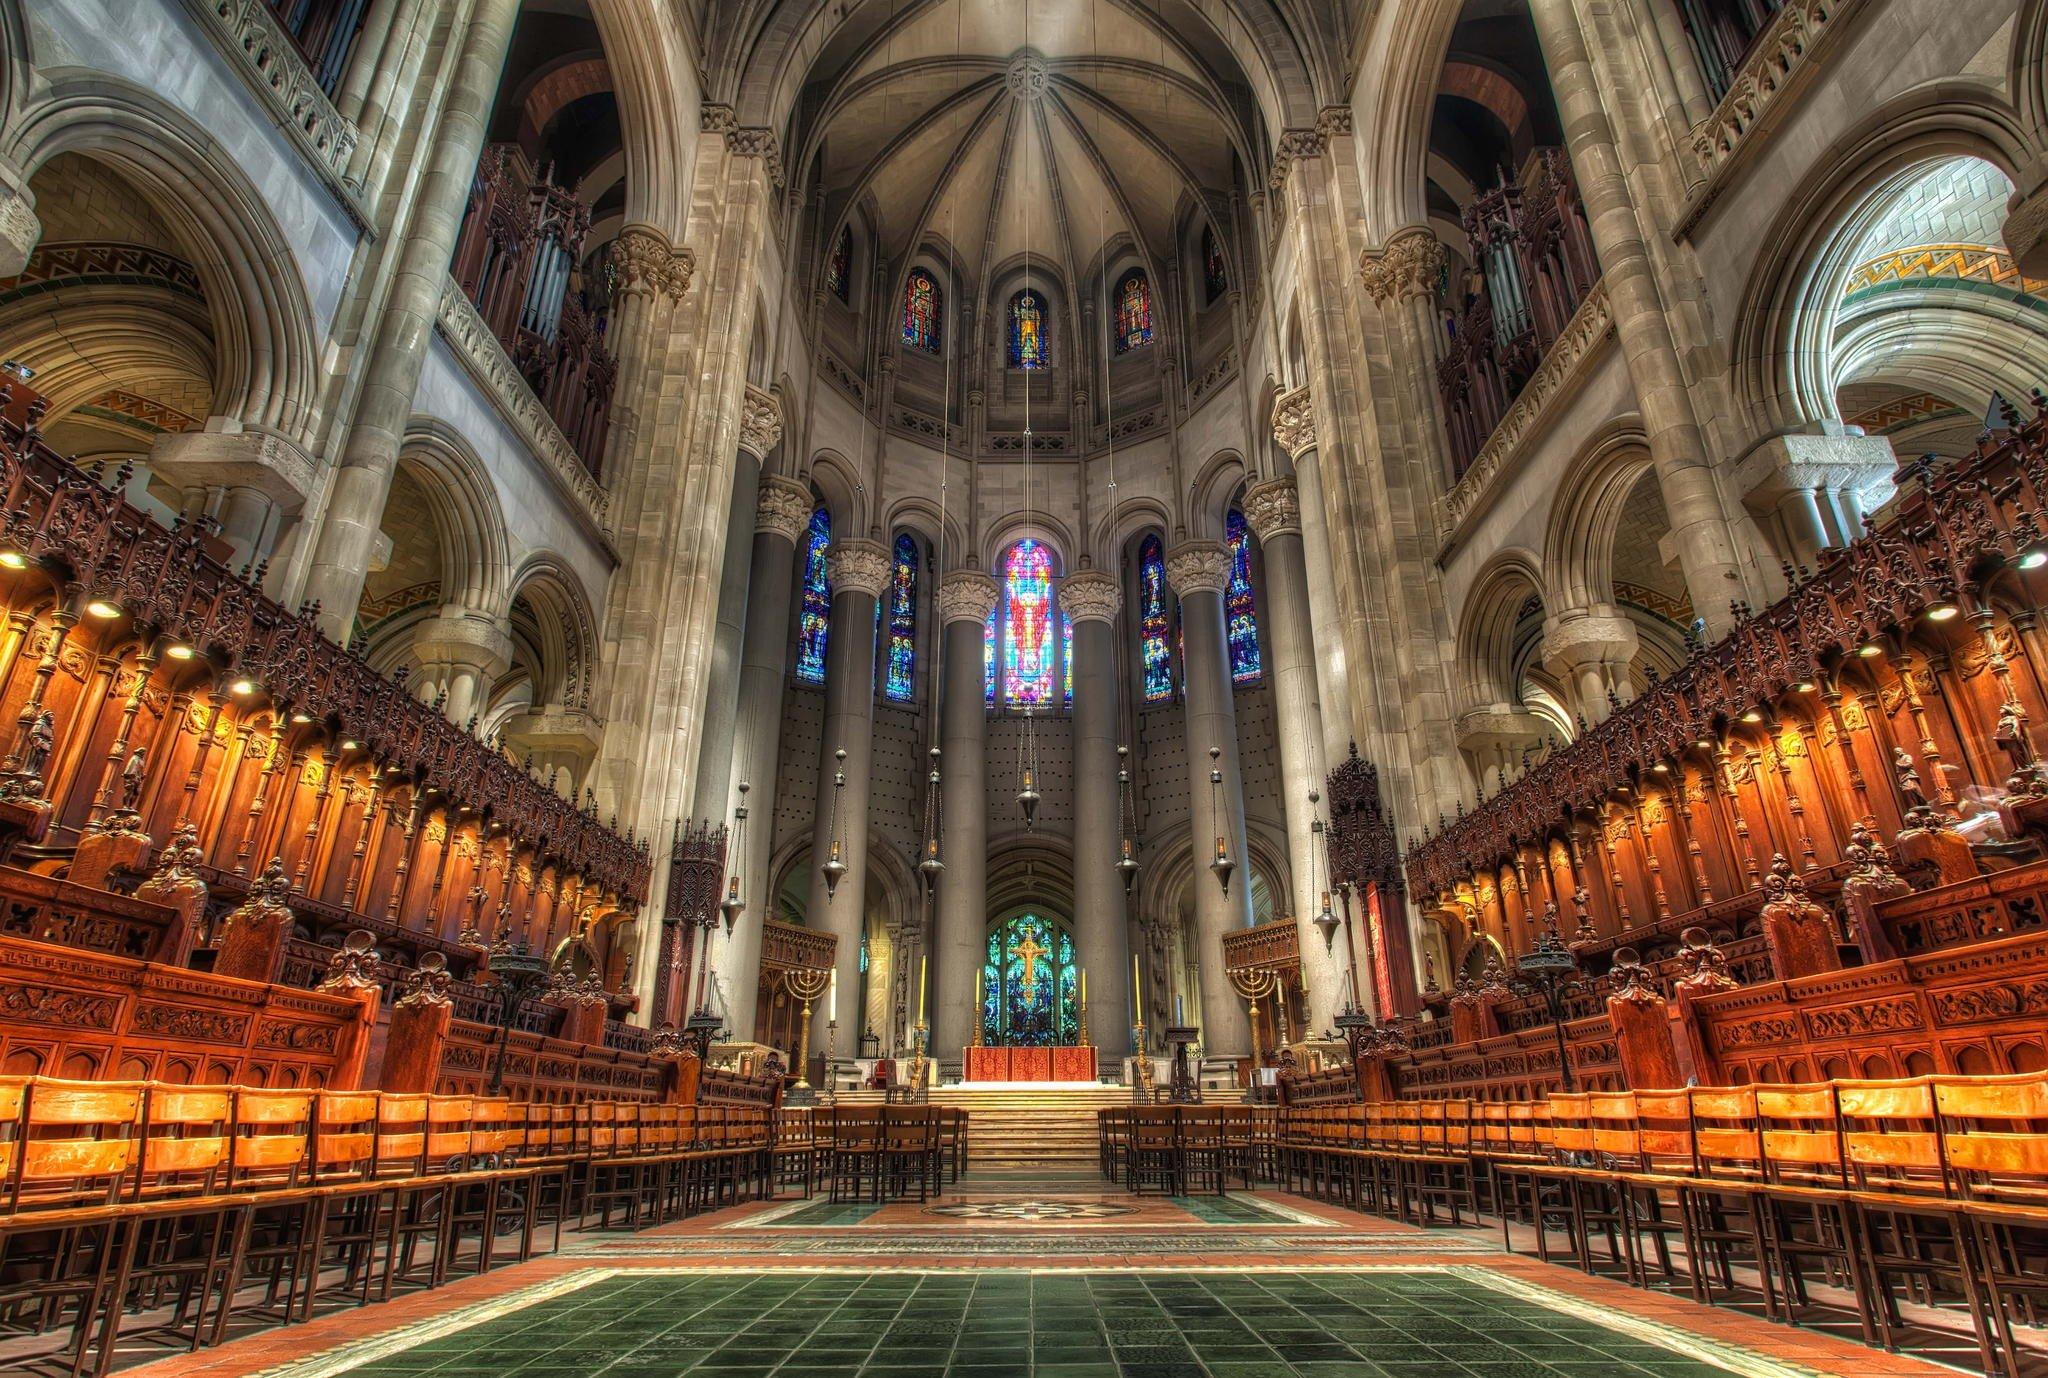 http://www.thousandwonders.net/Cathedral+of+Saint+John+the+Divine